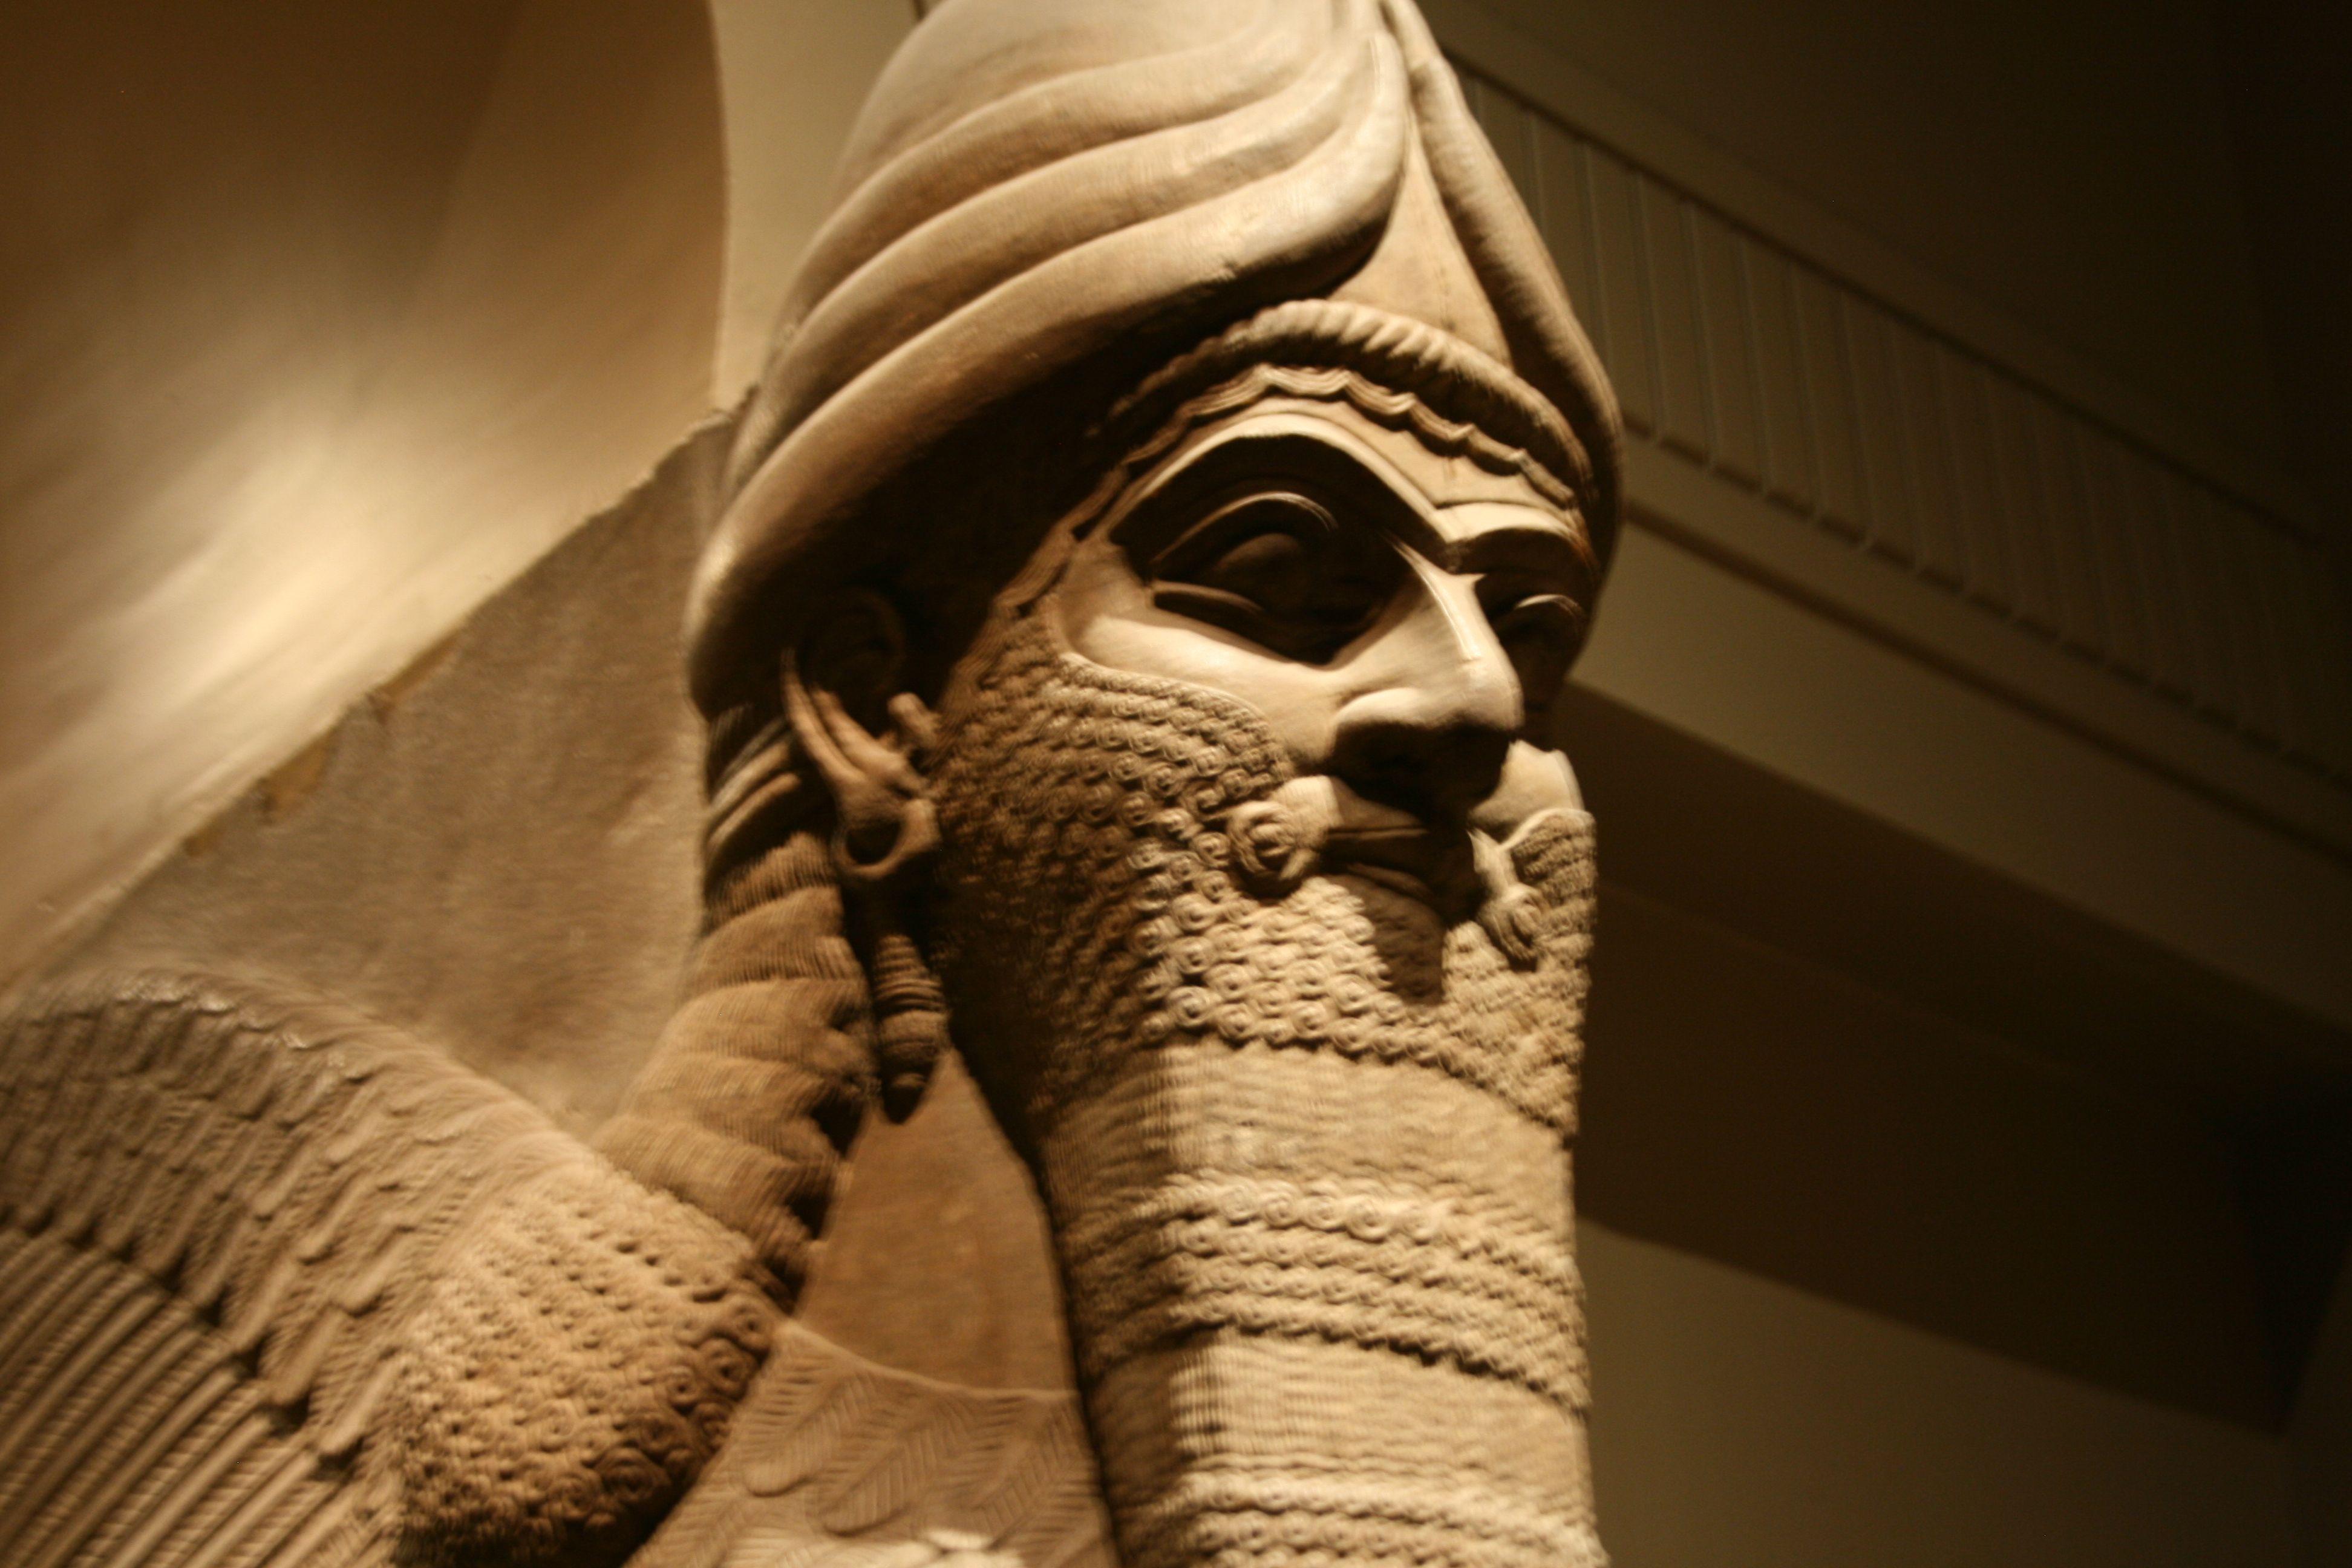 3c873057597f99e0abb1af53943993e3 - Secrets Of The Dead Gardens Of Babylon